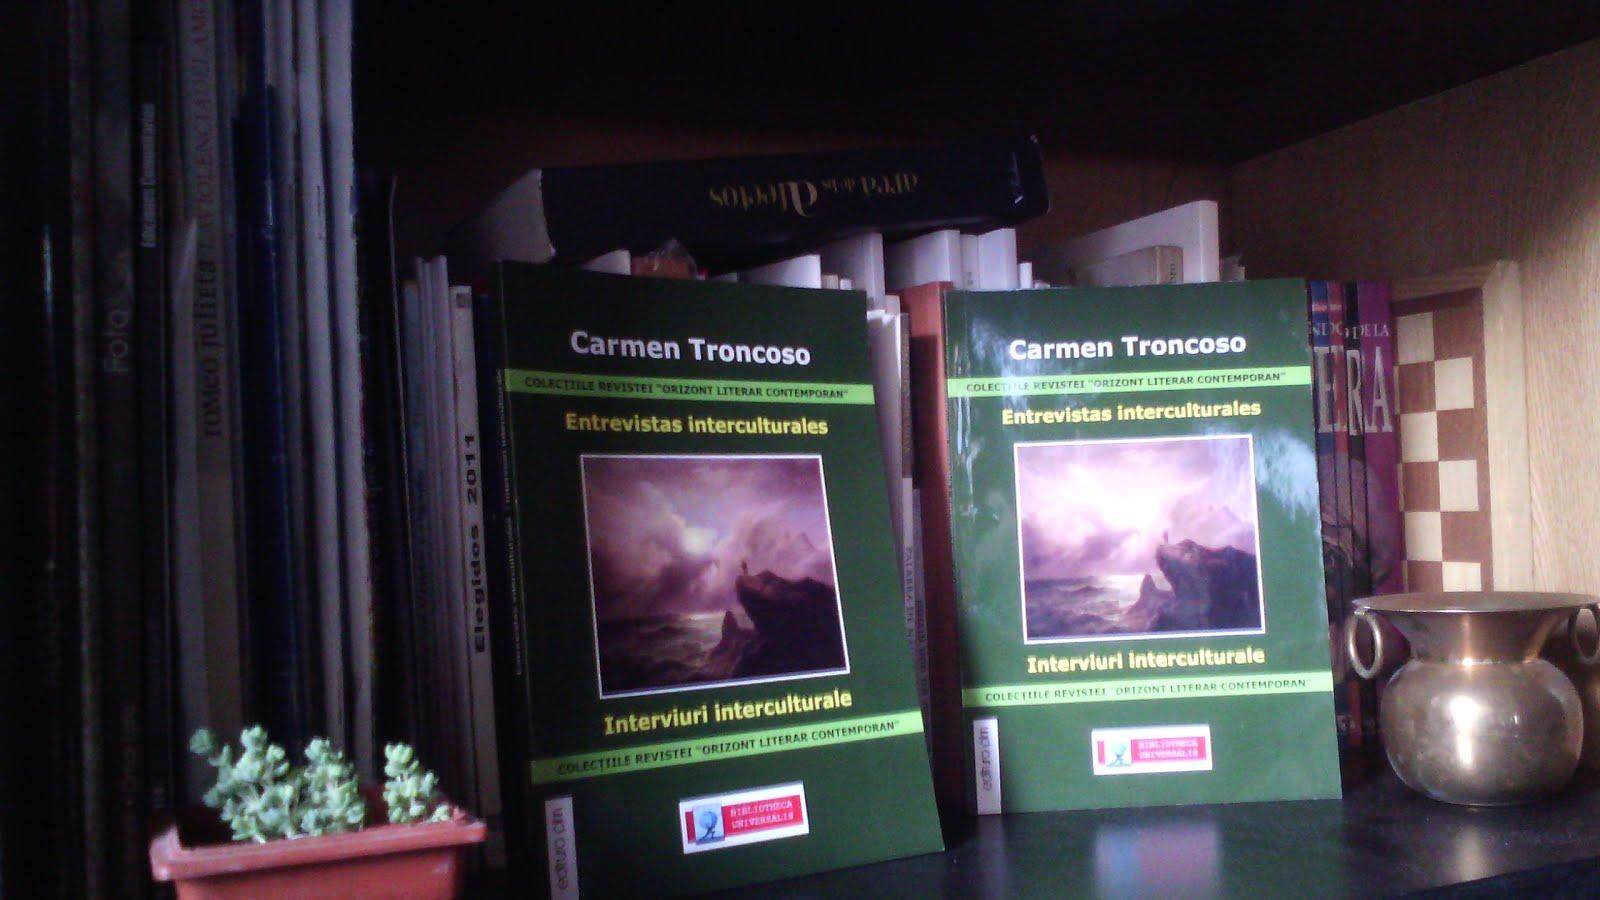 BIBLIOTHECA UNIVERSALIS - Revista ORIZONT LITERAR CONTEMPORAN Bucarest - Rumania